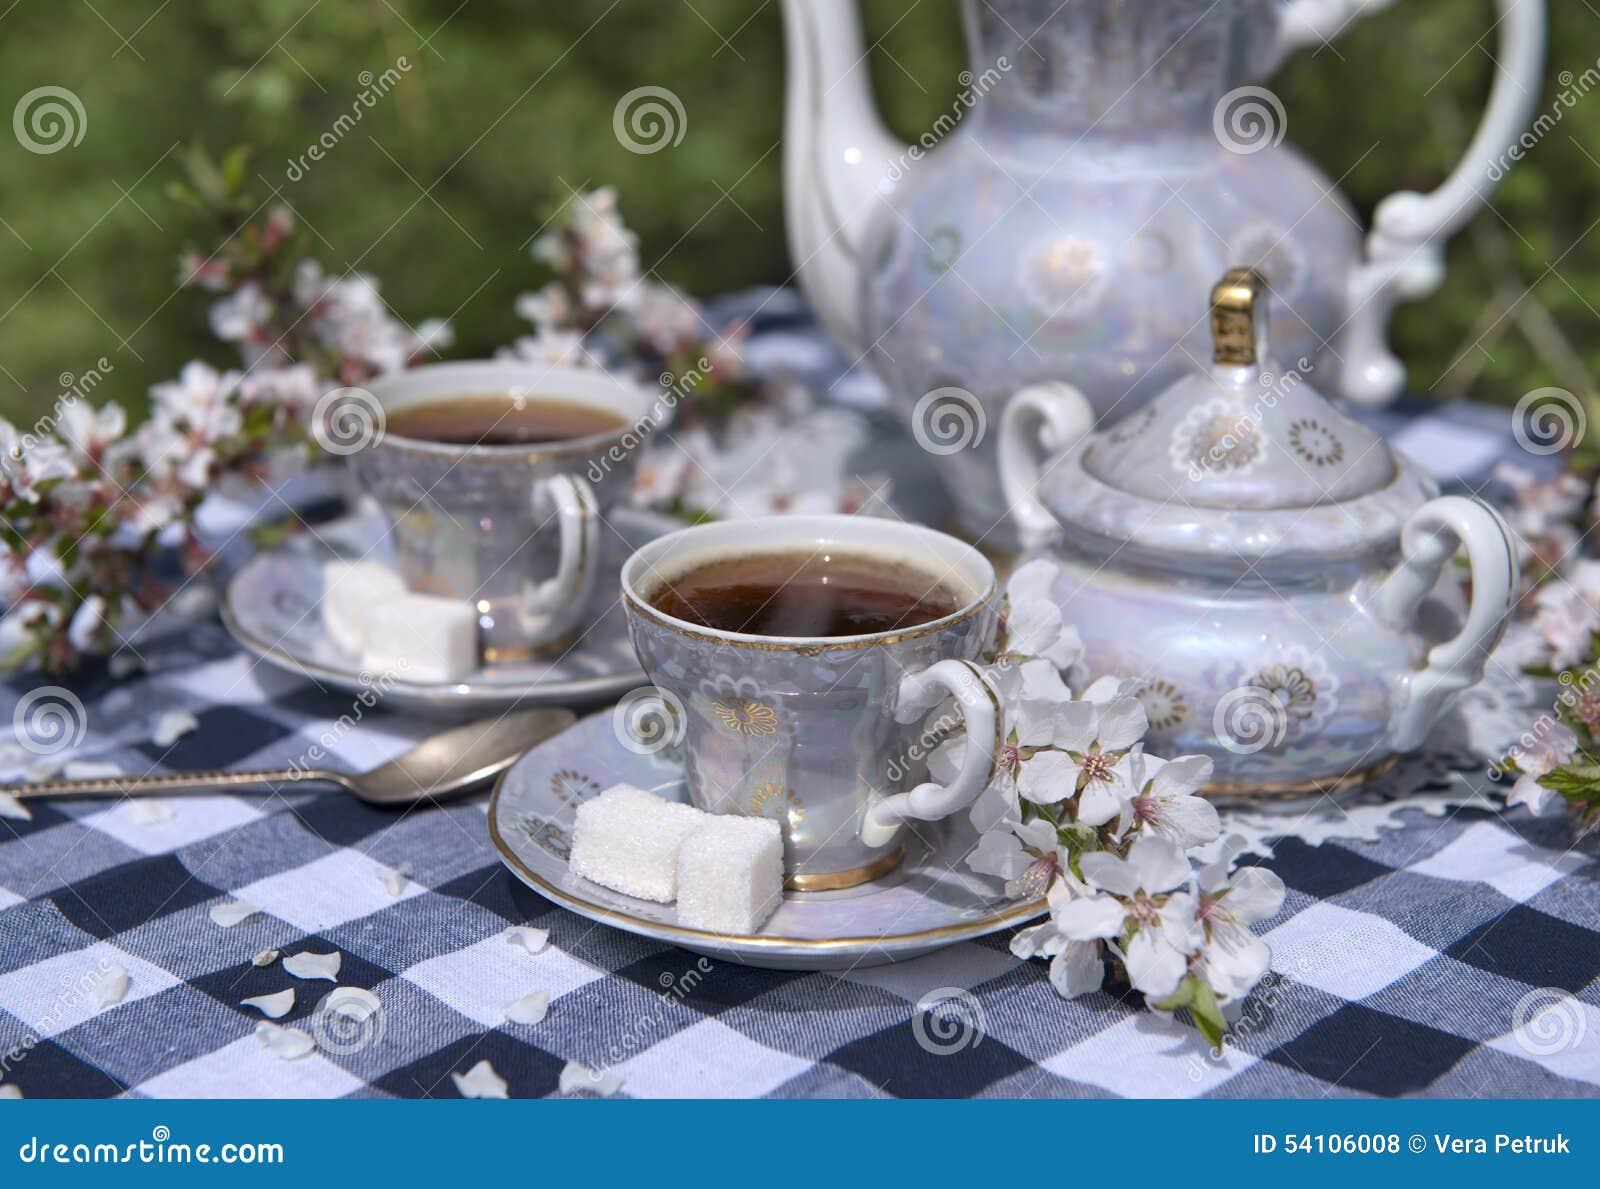 afternoon tea in spring garden stock photo image of grandmother breakfast 54106008. Black Bedroom Furniture Sets. Home Design Ideas